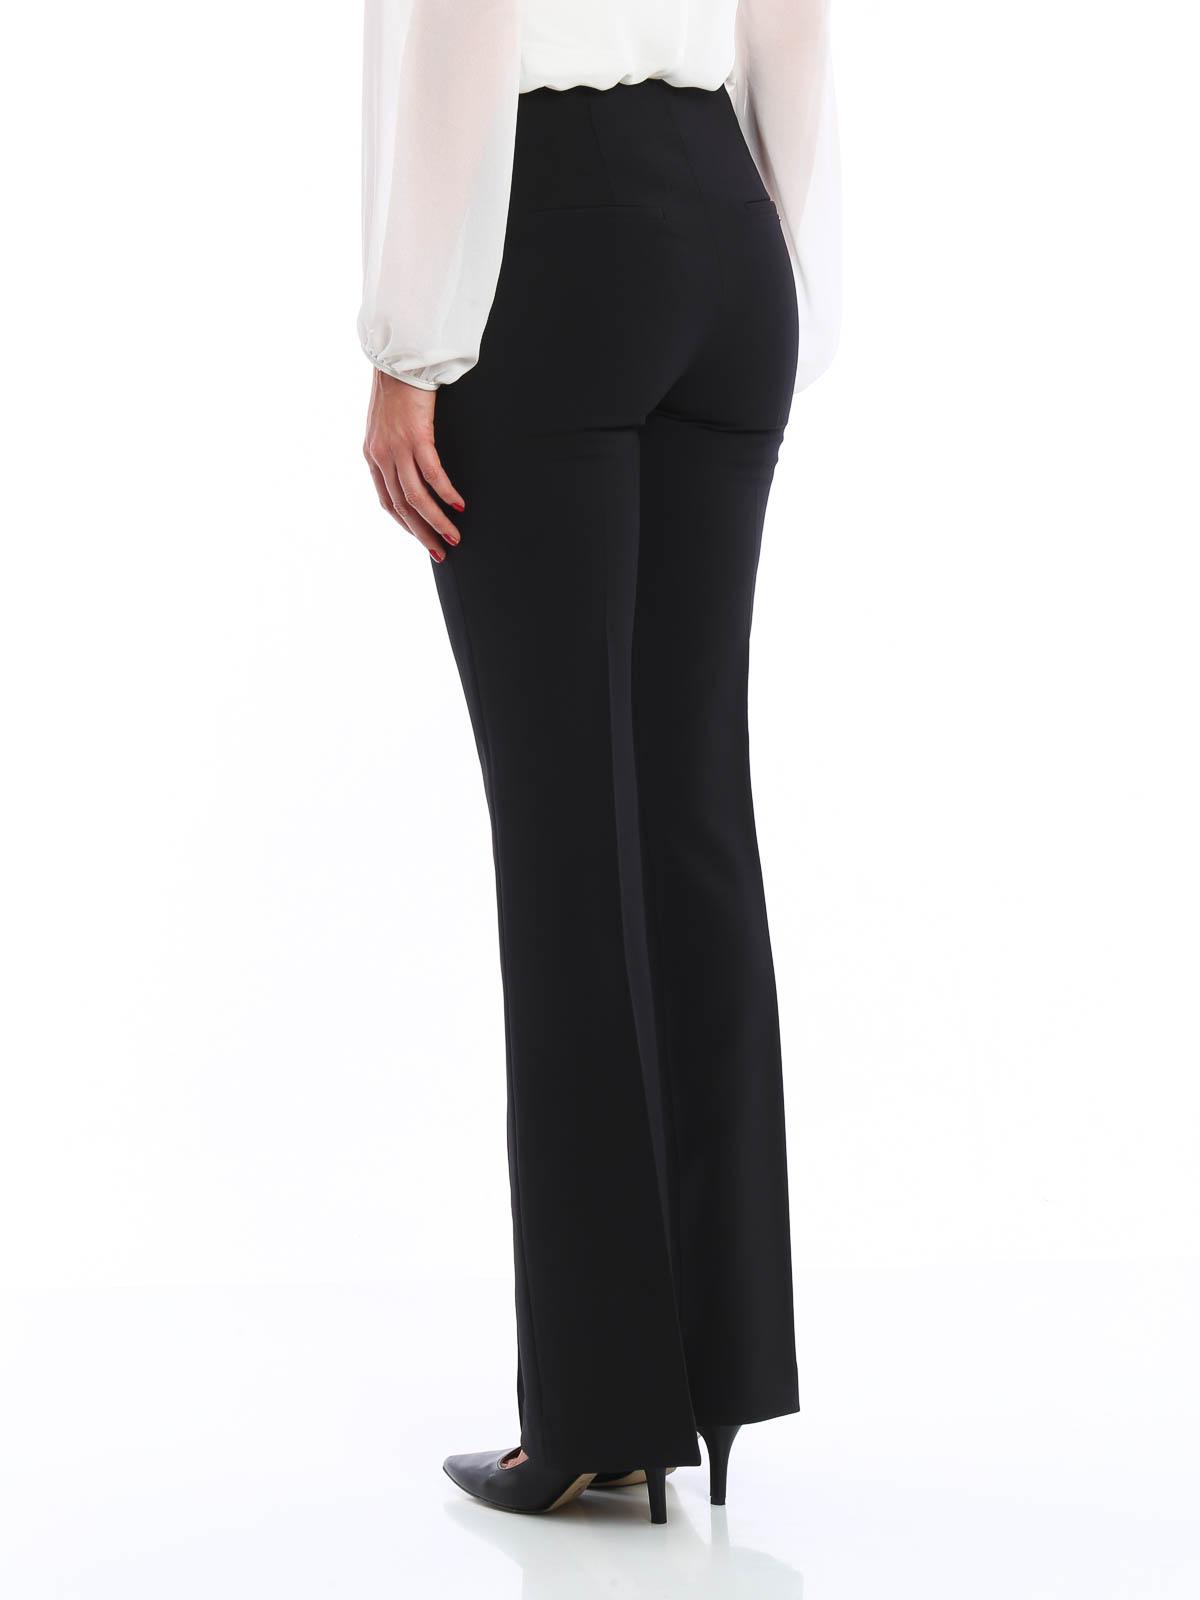 bc1469b769 iKRIX BLUMARINE  Pantalones de sastrerìa - Pantalón De Vestir Negro Para  Mujer